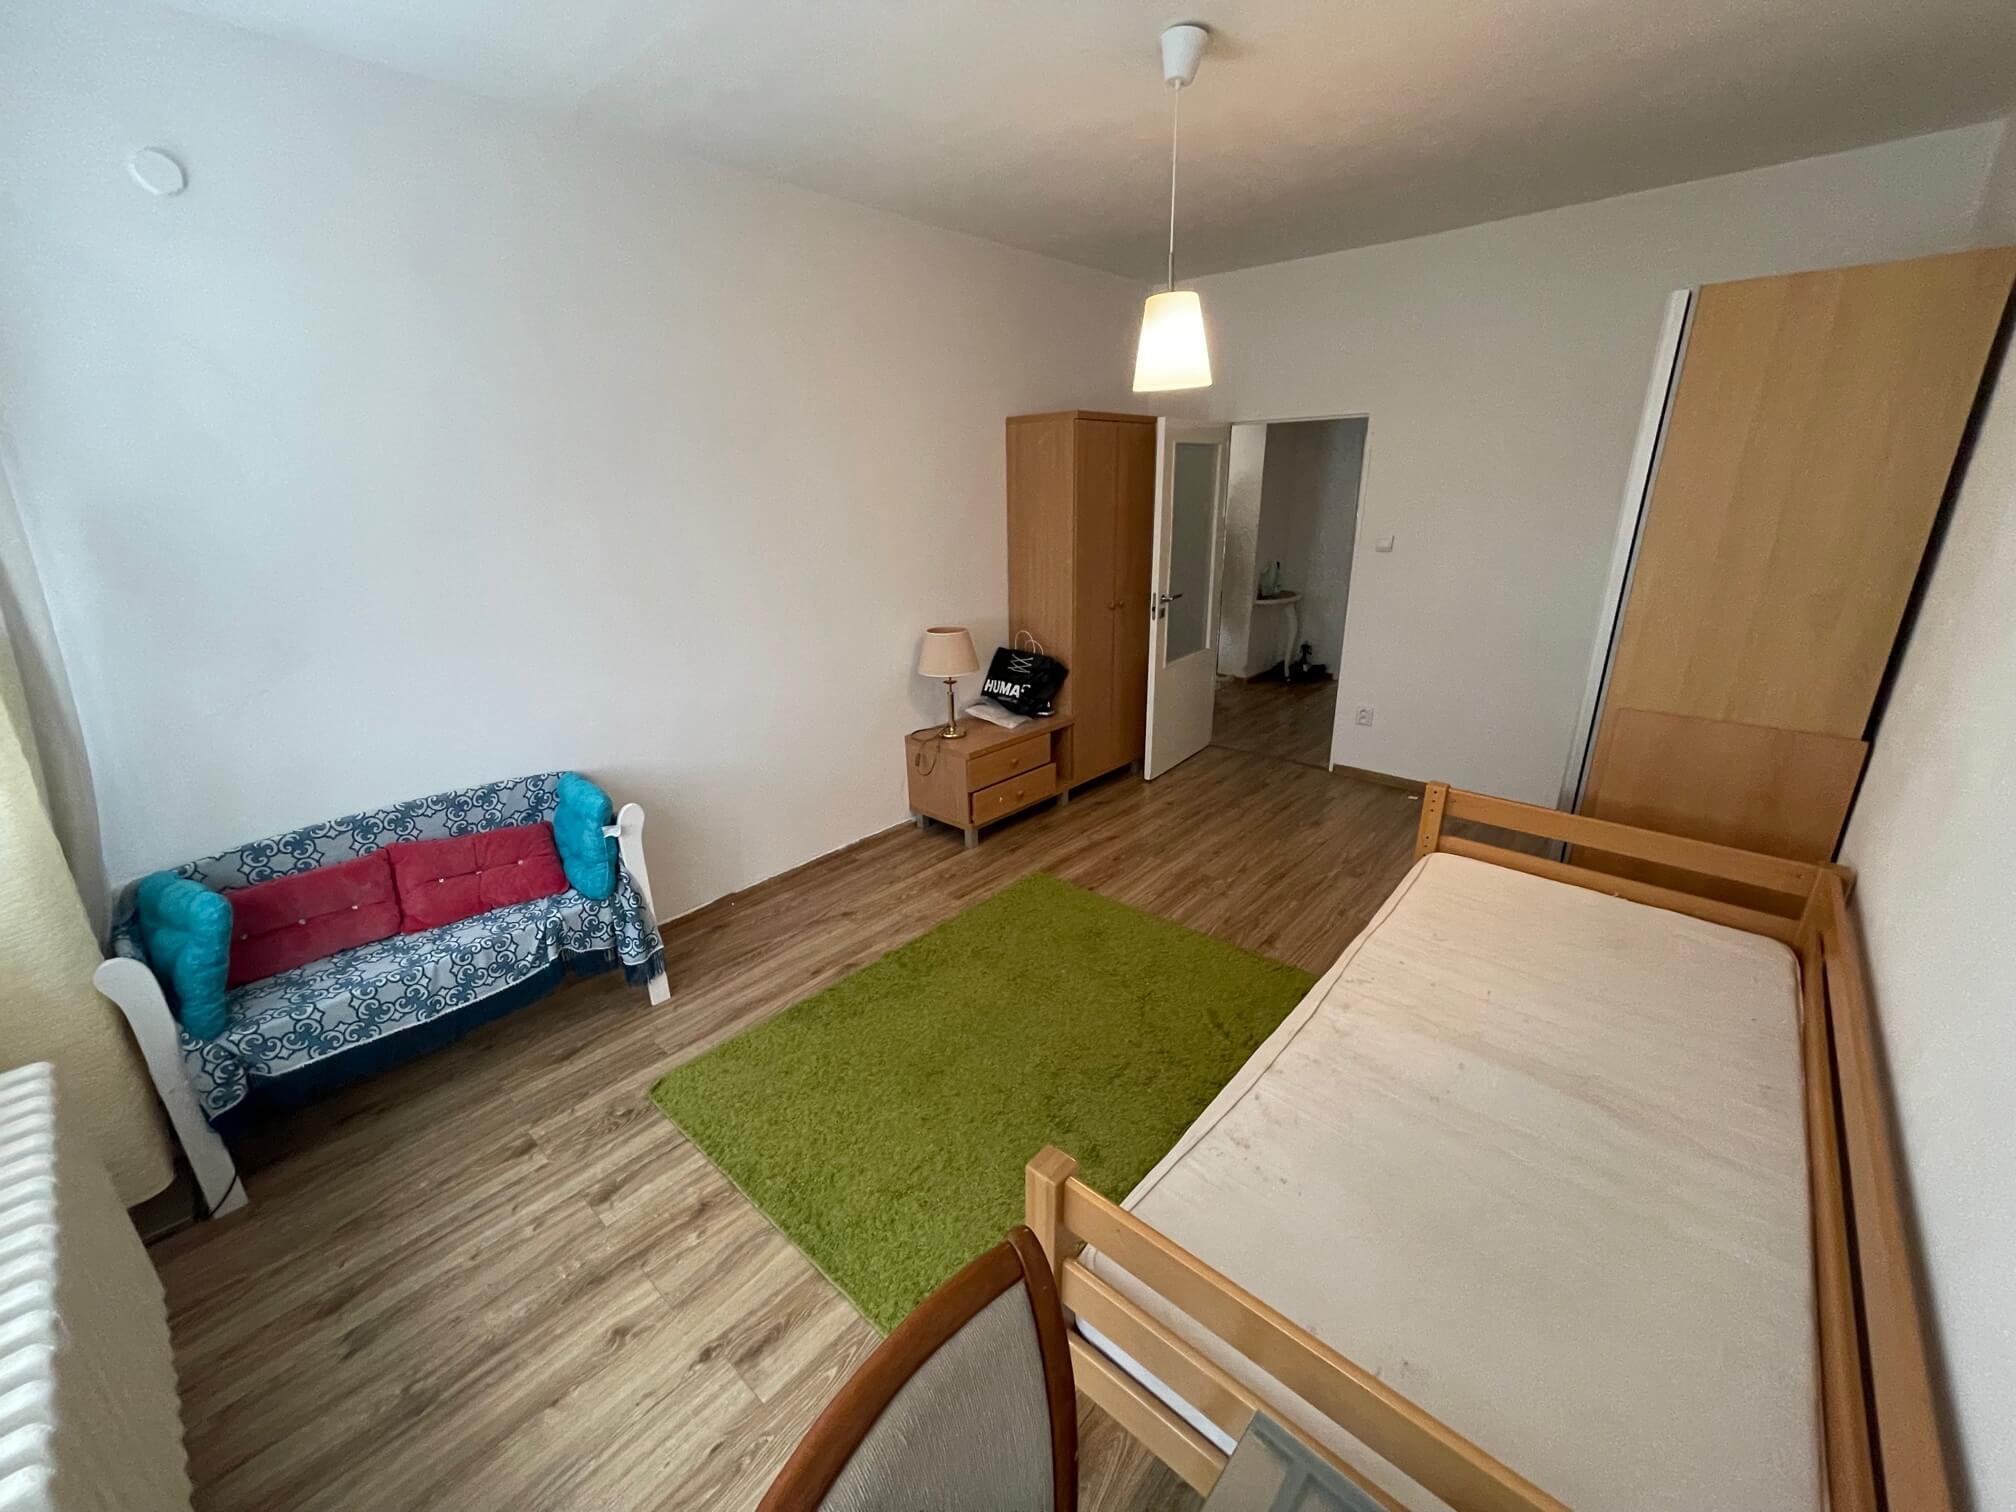 Exkluzívne na prenájom 3 izbový byt, 83m2, 2x loggia 4,5m2, Karolovka, Janotová 8-10